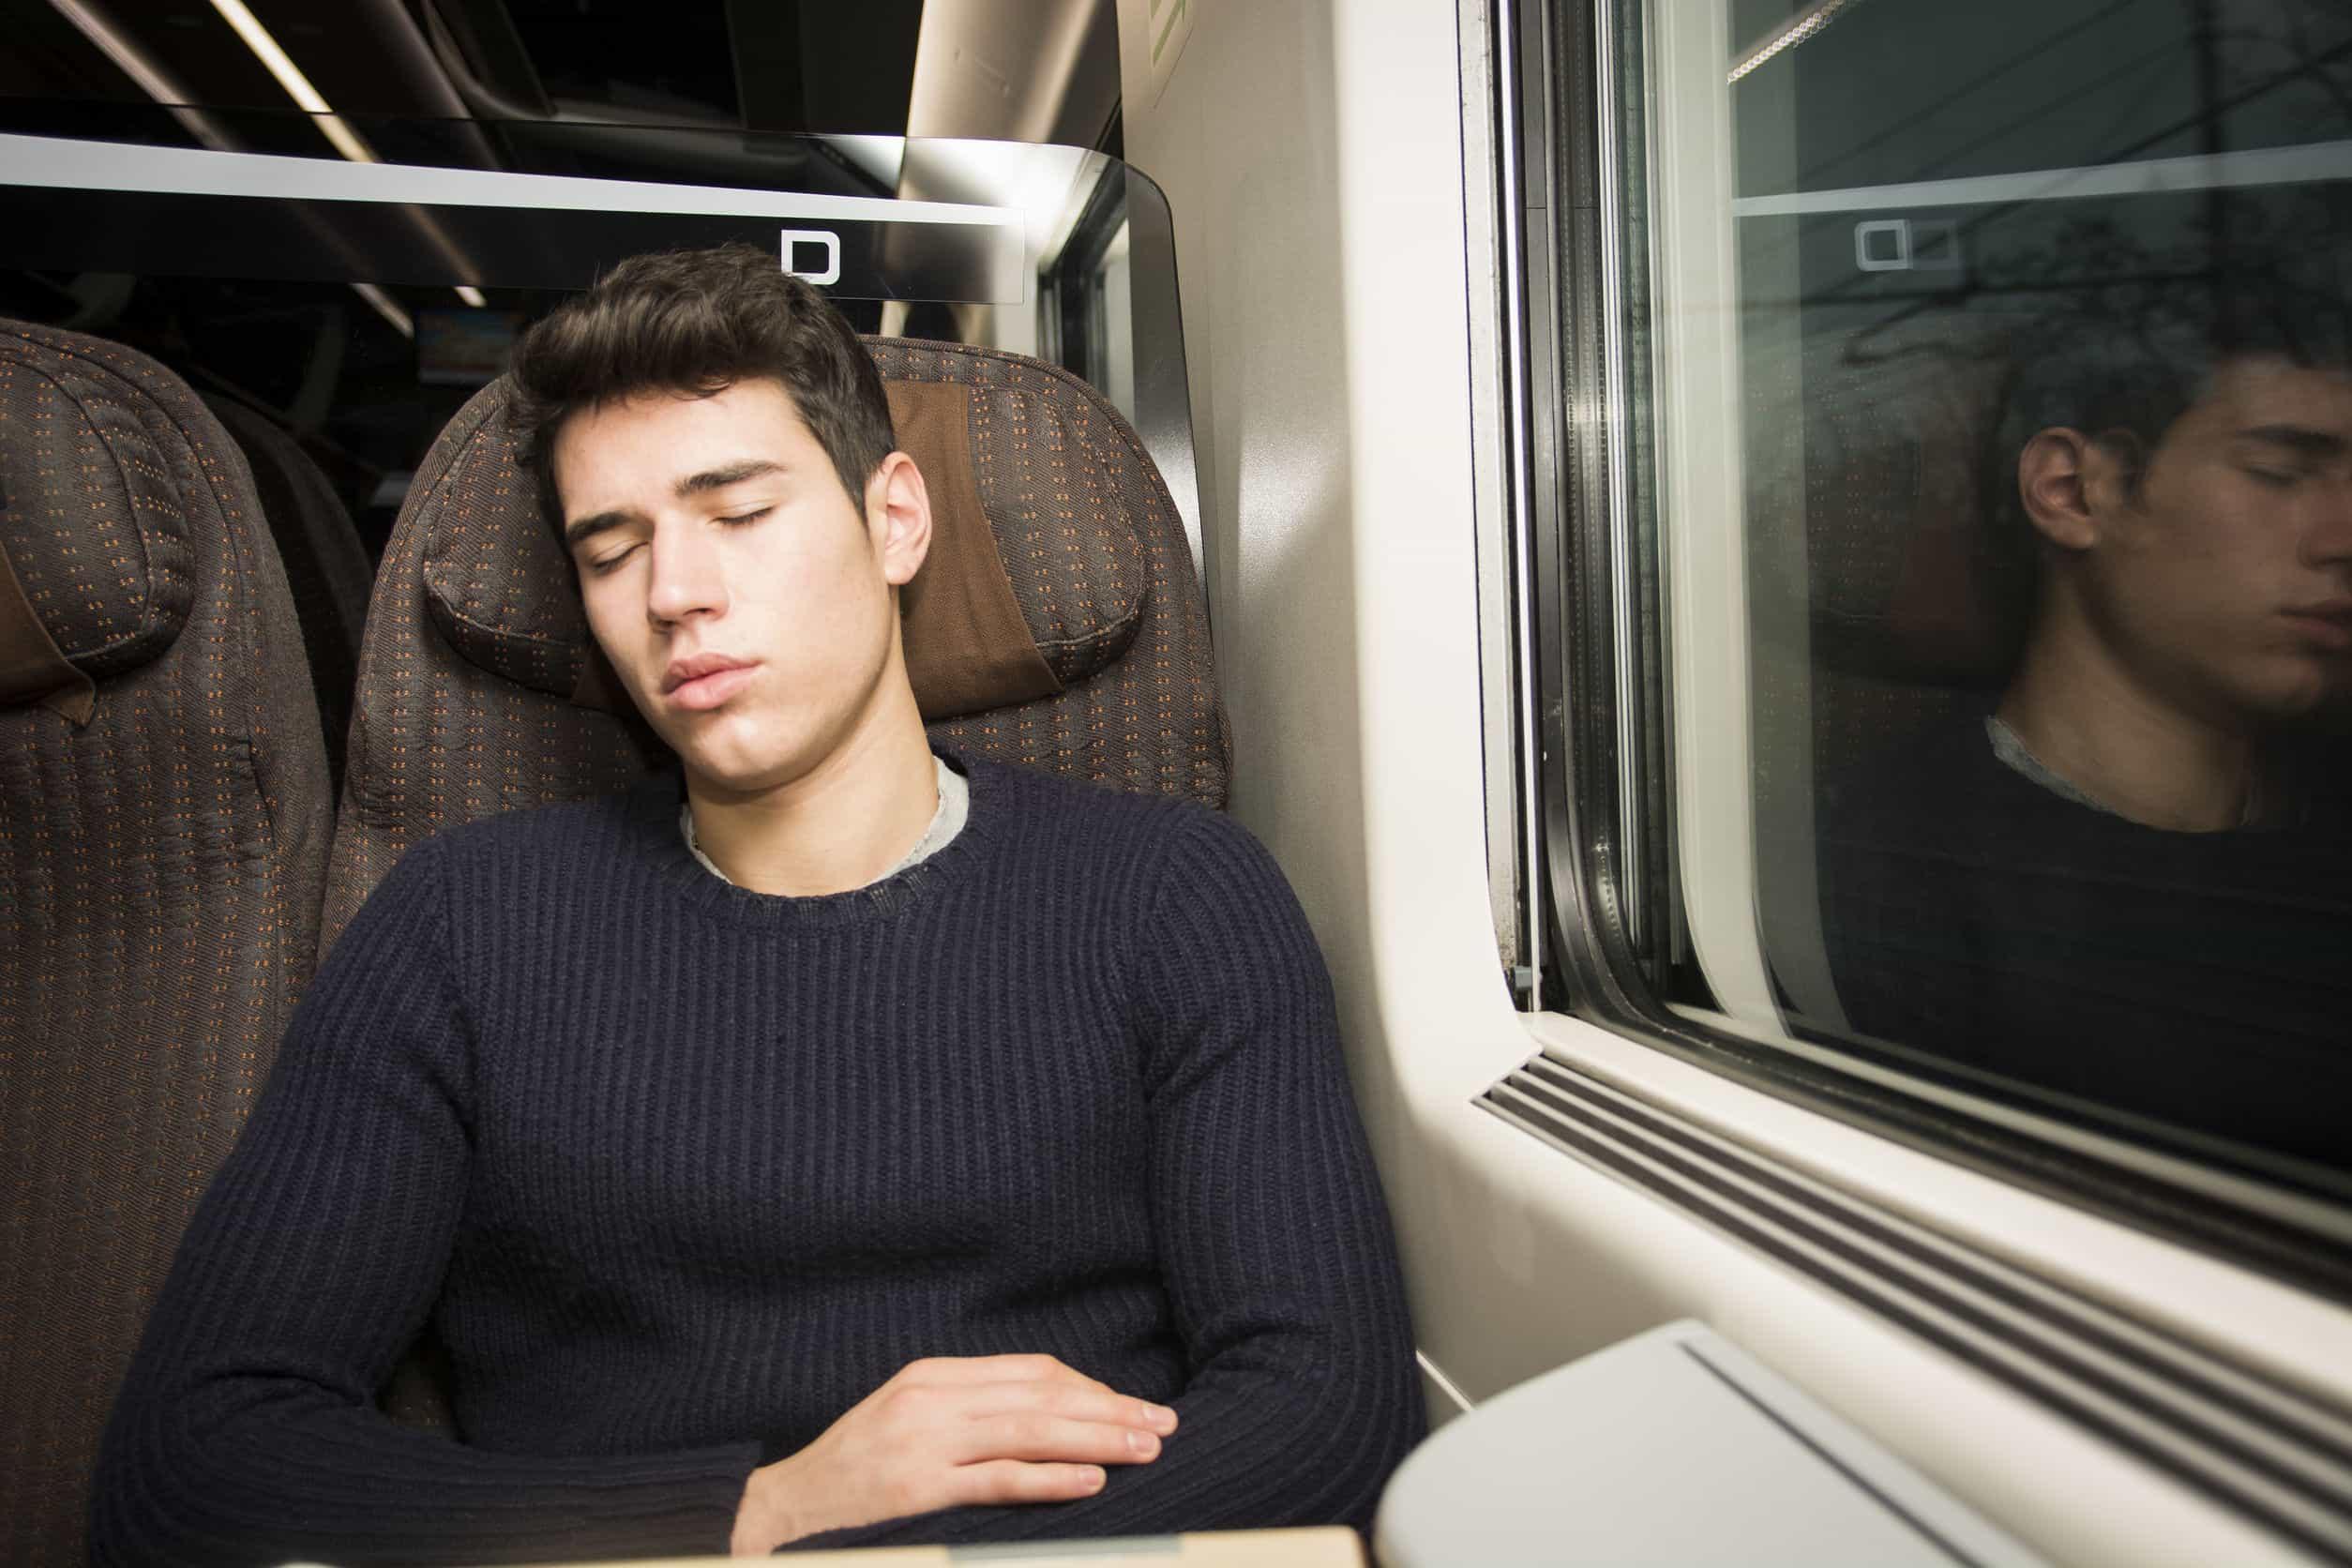 Pasajero, durmiendo comodo